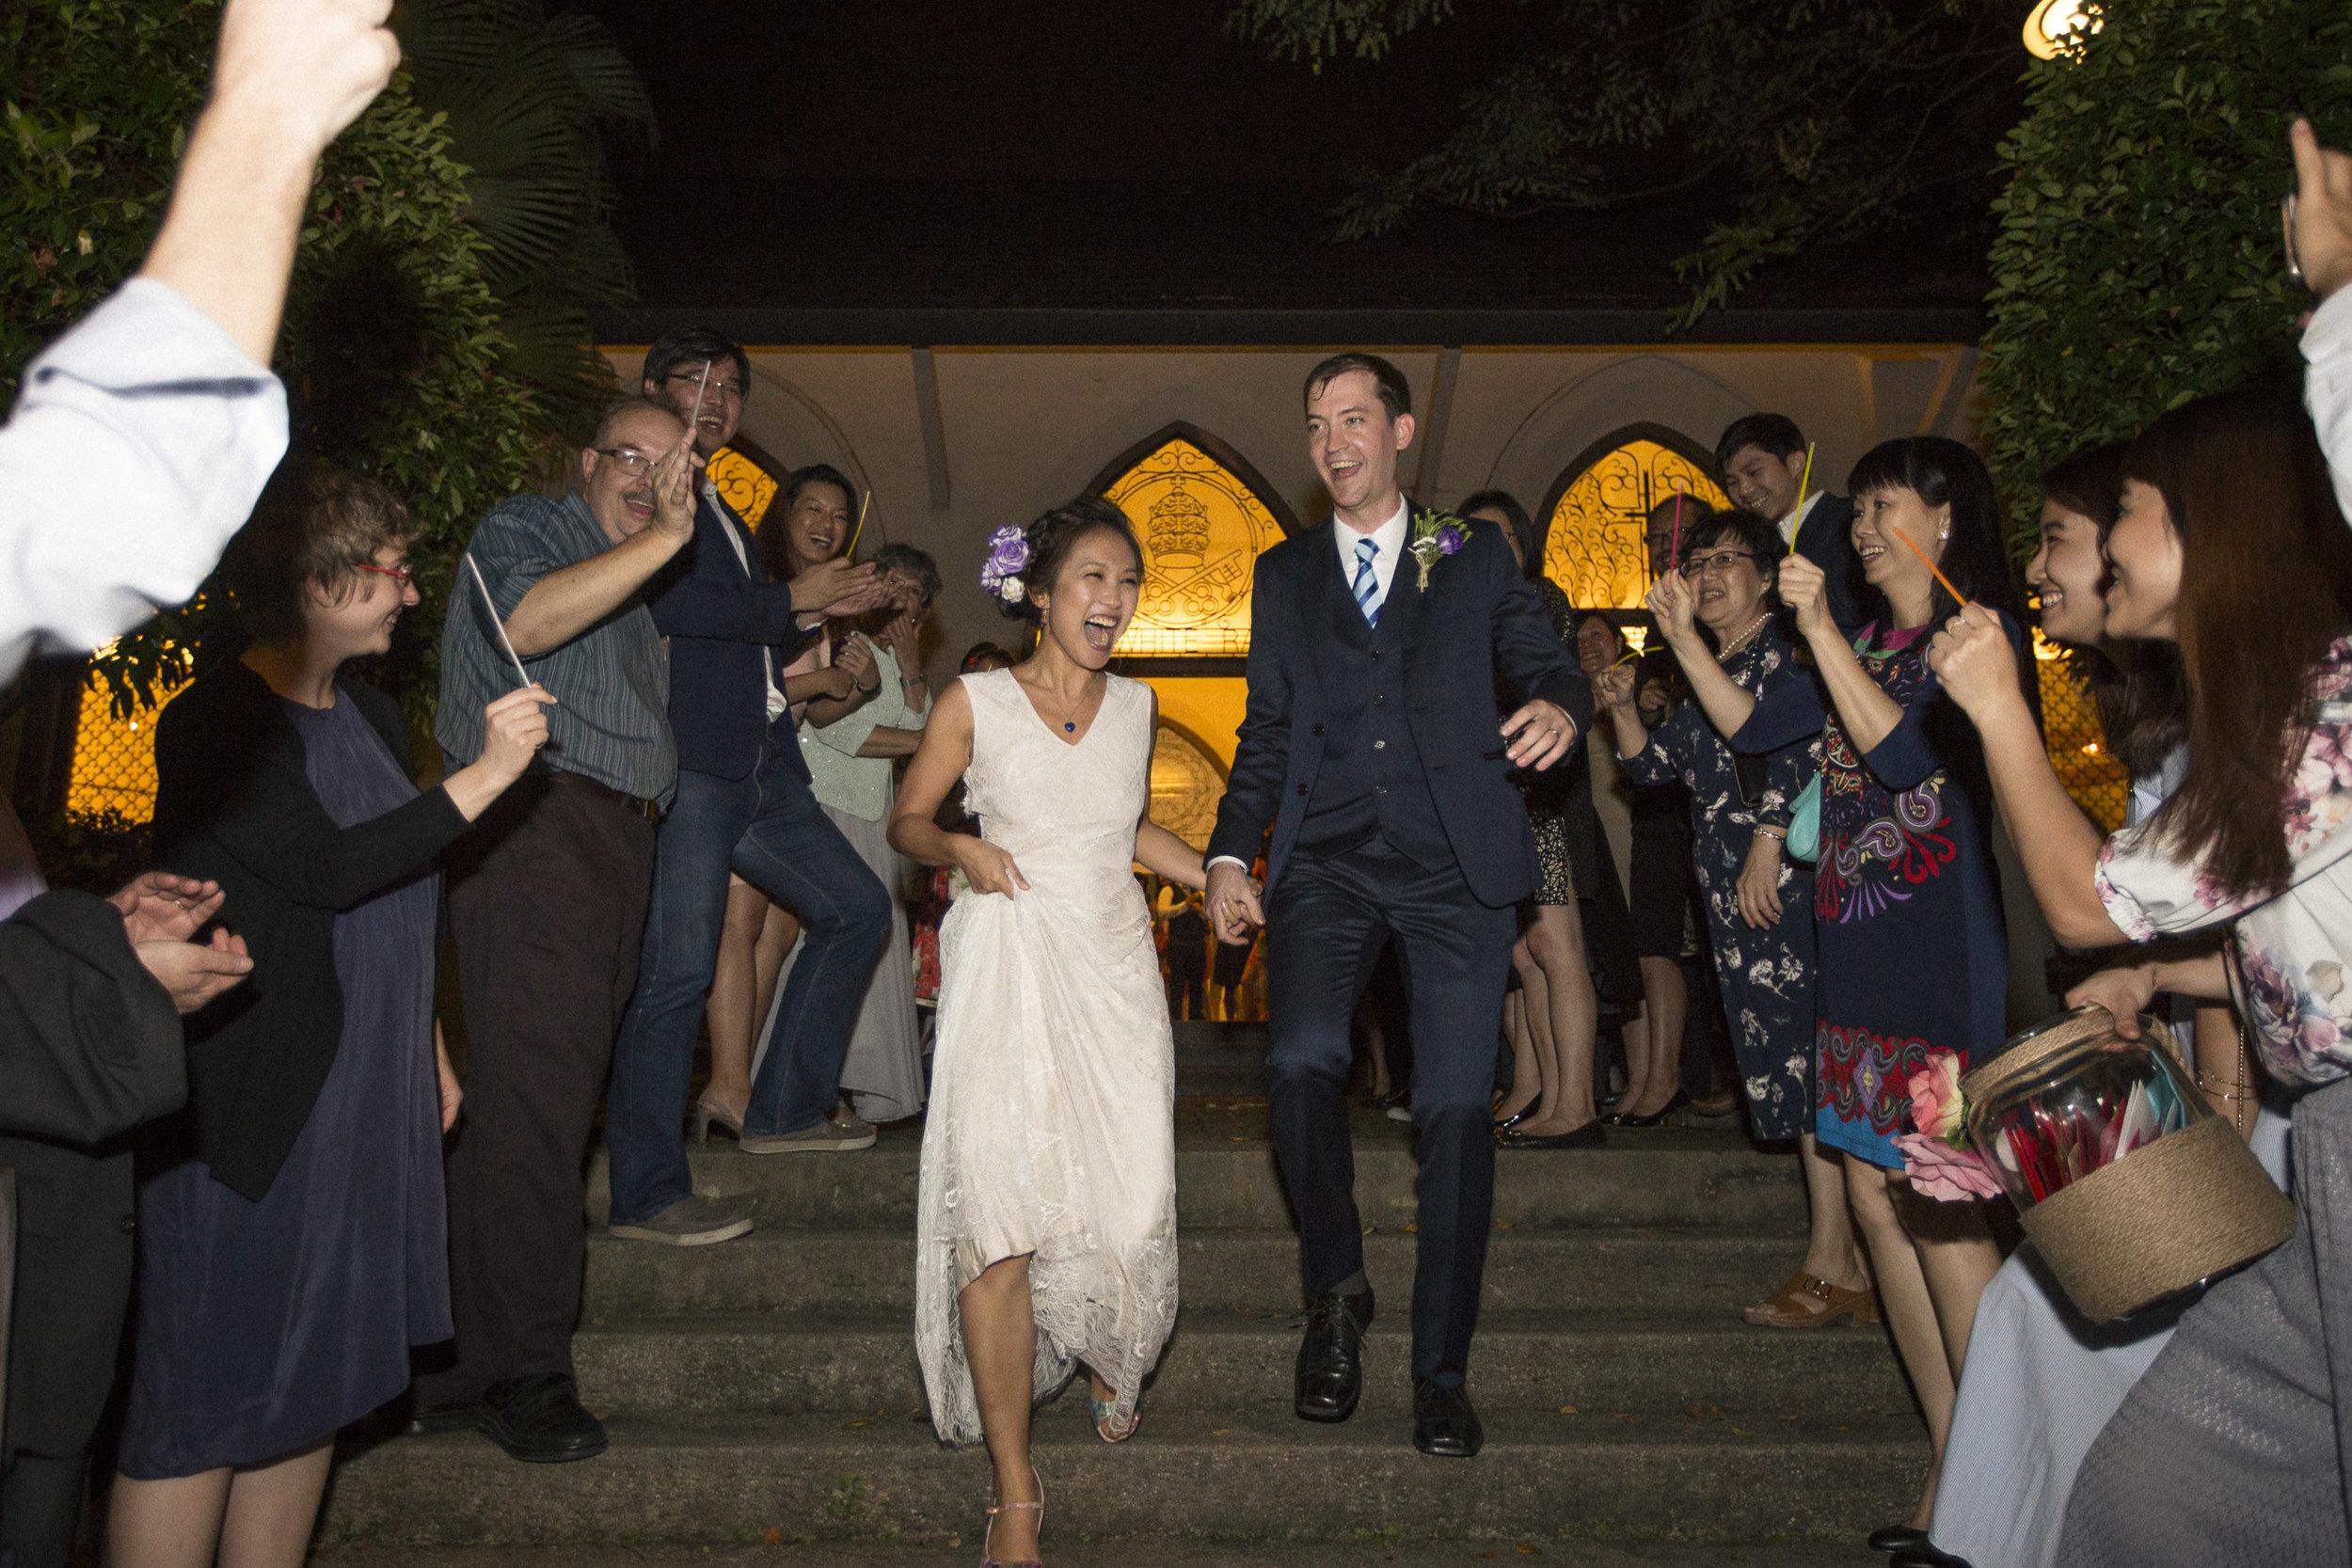 singapore-wedding-photographer-hiram-joyce-078.jpg